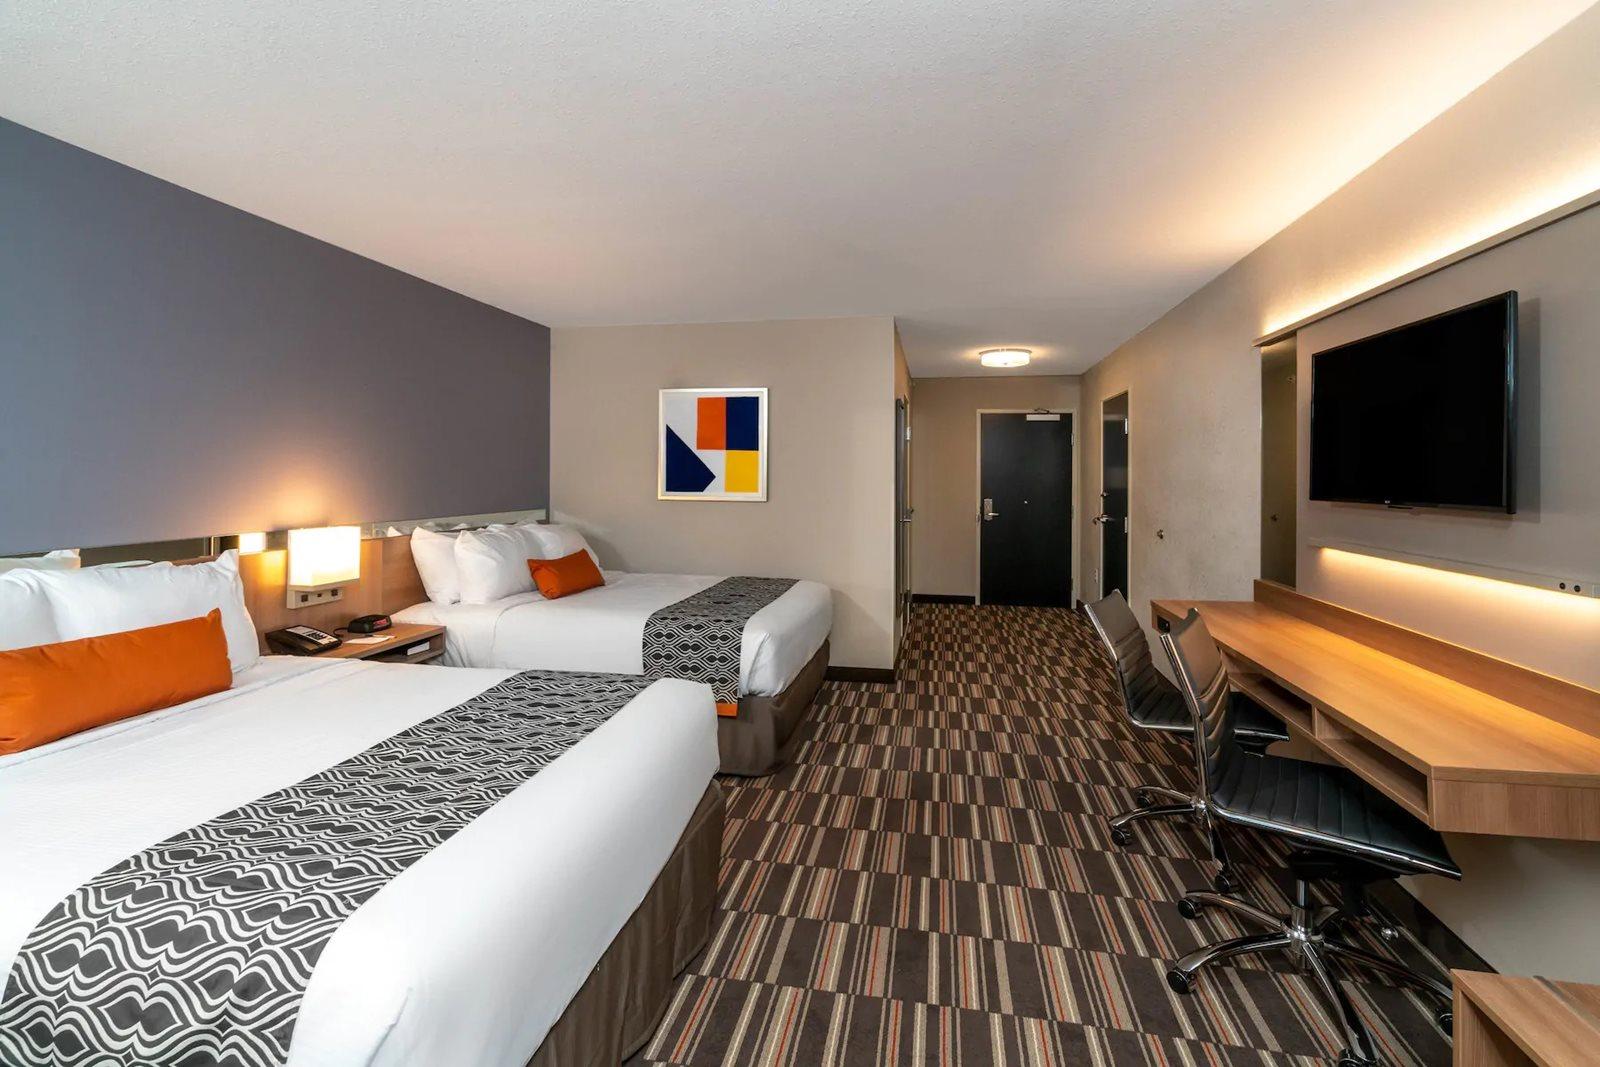 Microtel-Carlisle-PA-guest-room.jpg